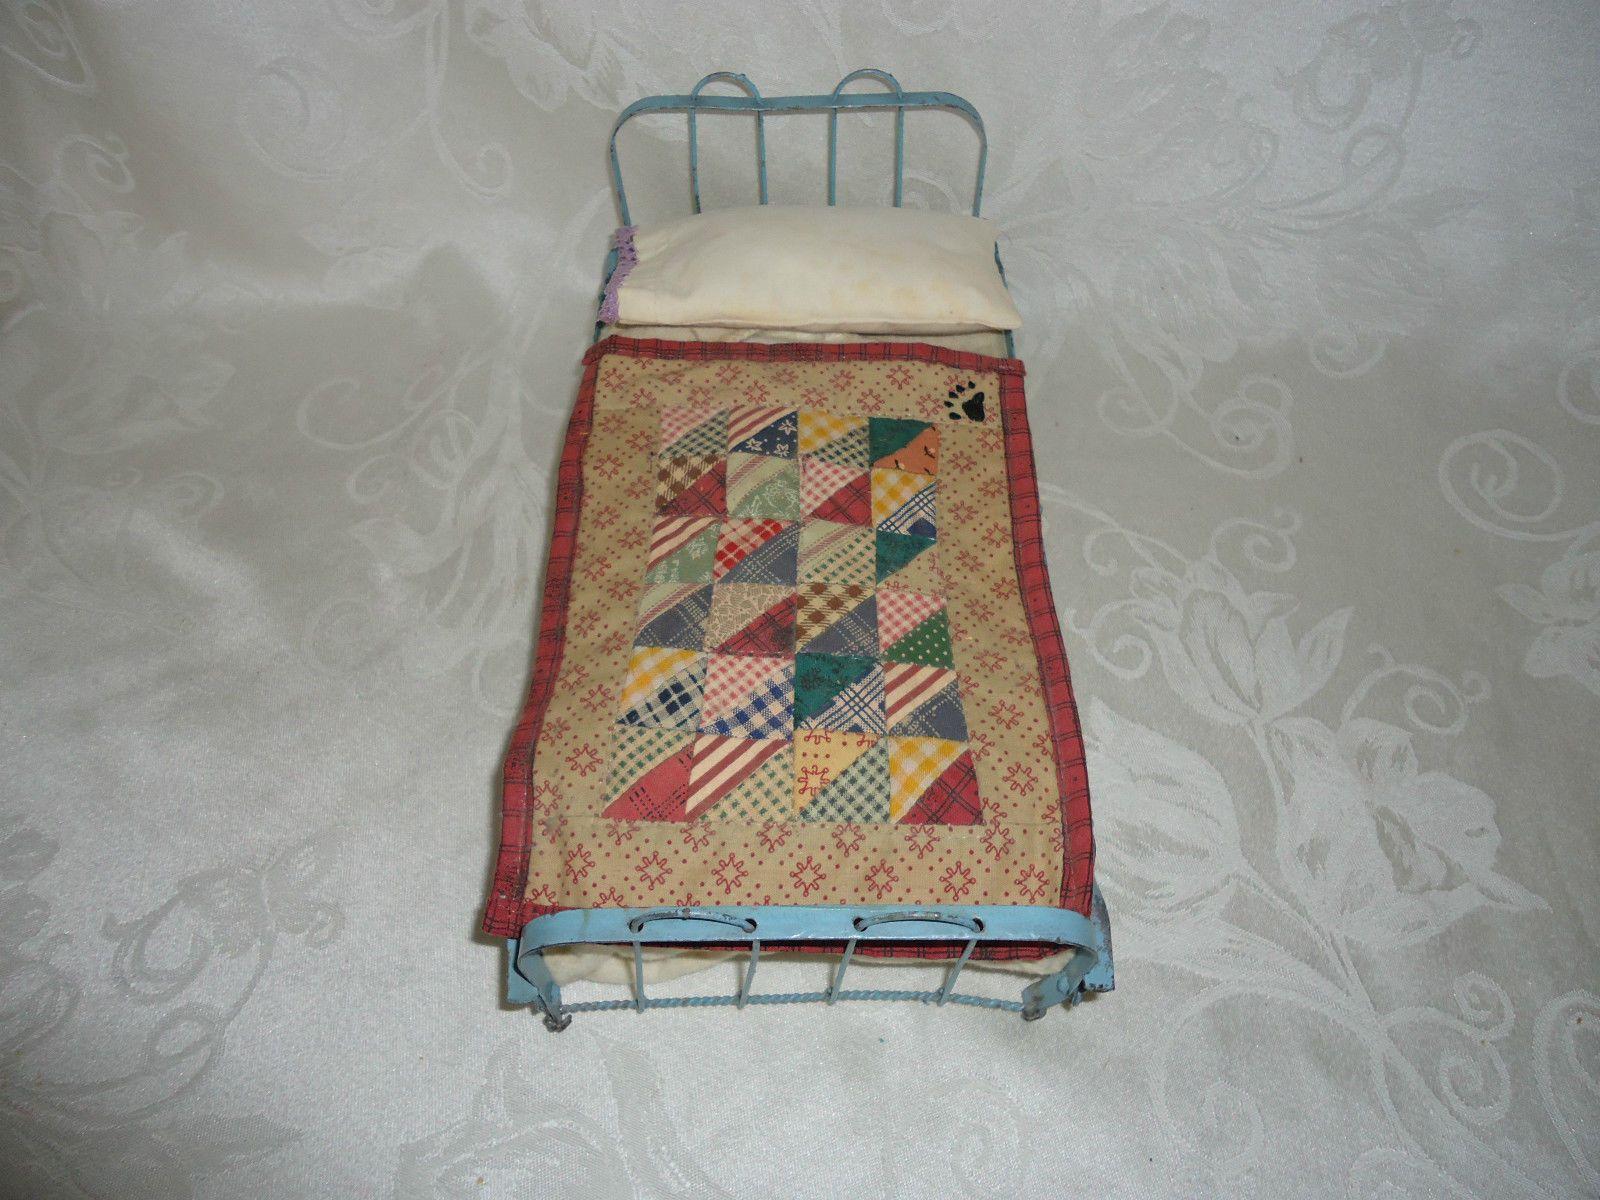 Antique Wrought Iron Tin Fancy Dollhouse Bed Bedding | eBay